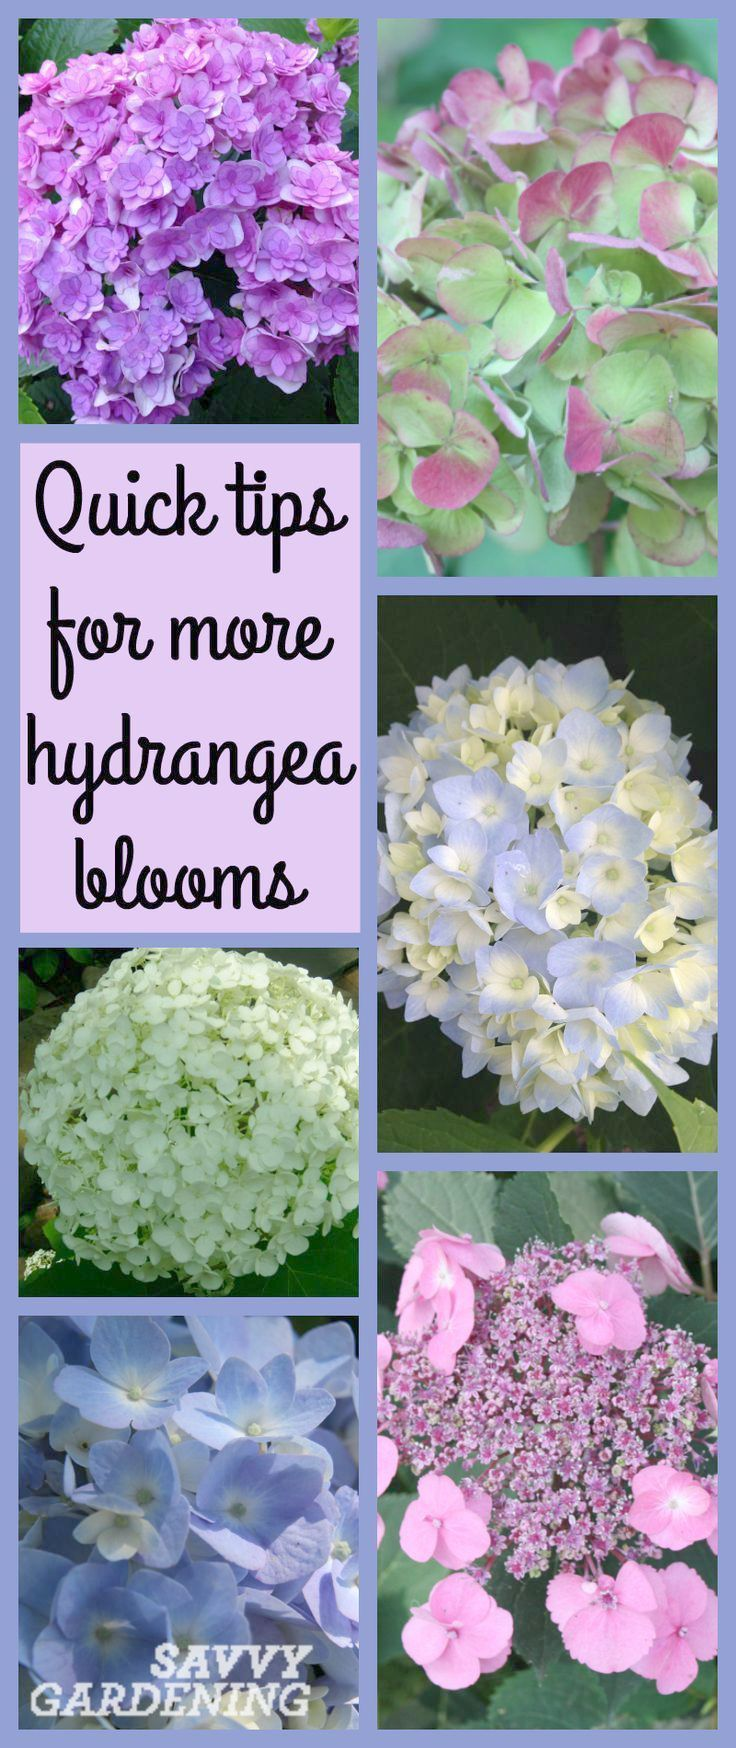 Gardening Leave In Australia On Gardening Gloves That Keep Hands Clean And Gardening Leave Jelentese Hydrangea Not Blooming Hydrangea Garden Growing Hydrangeas